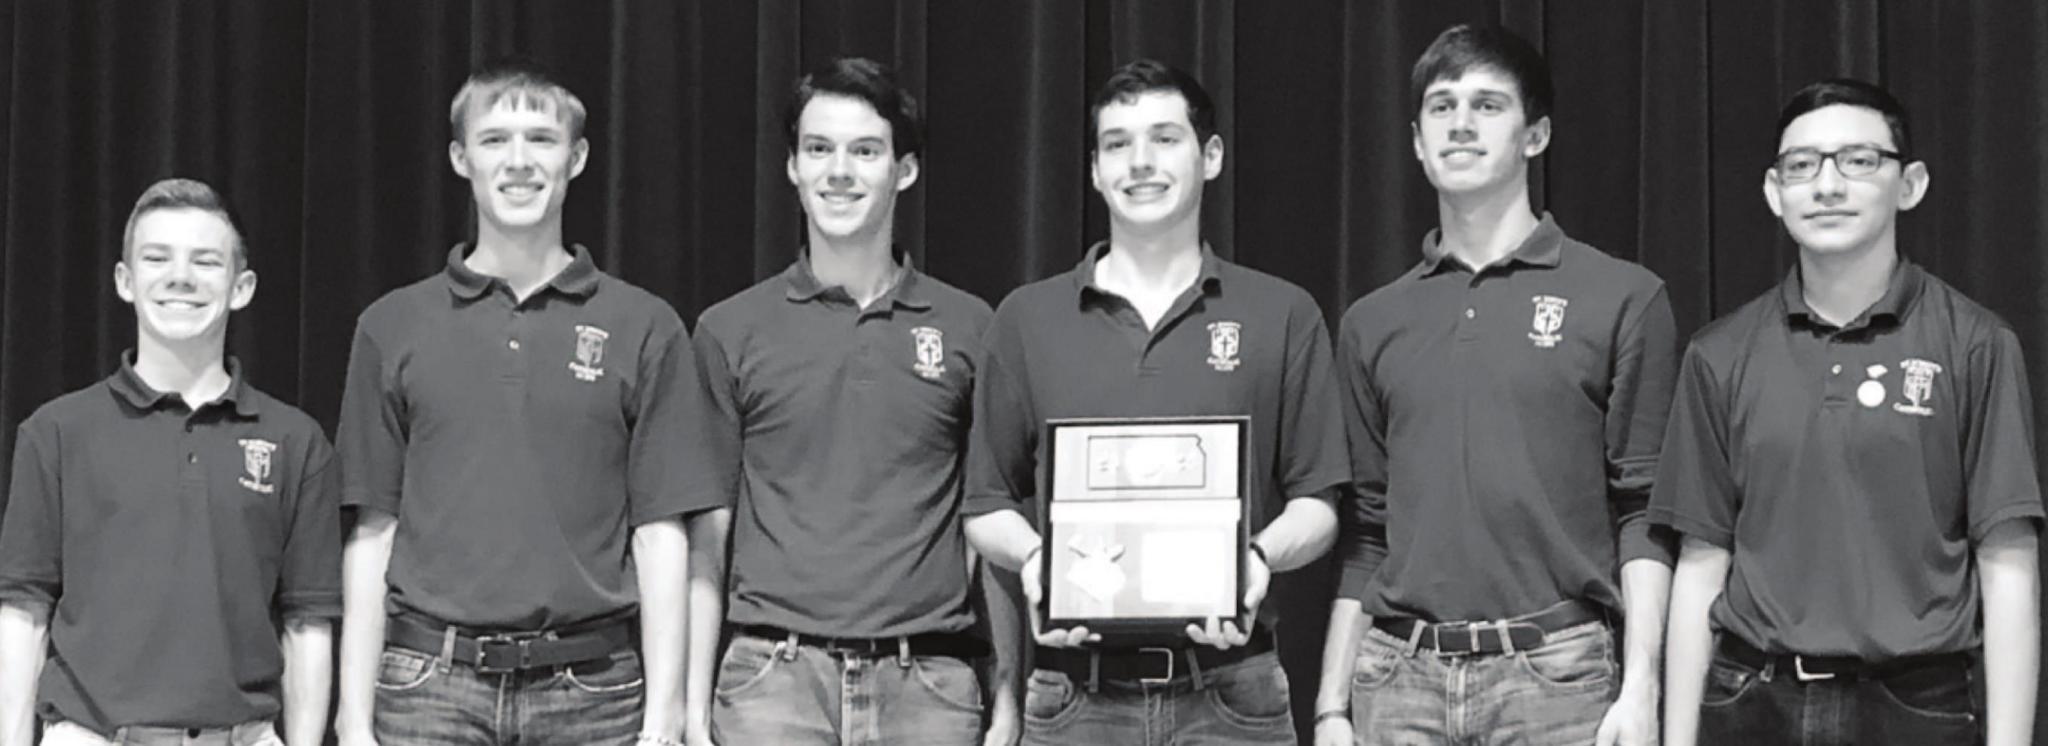 St. John's Scholars Bowl team are from left to right: Ben Thompson, Brandon Bates, Benjamin Walter, Jadyn Rosebaugh, Braden Dameron, Sergio Lopez.